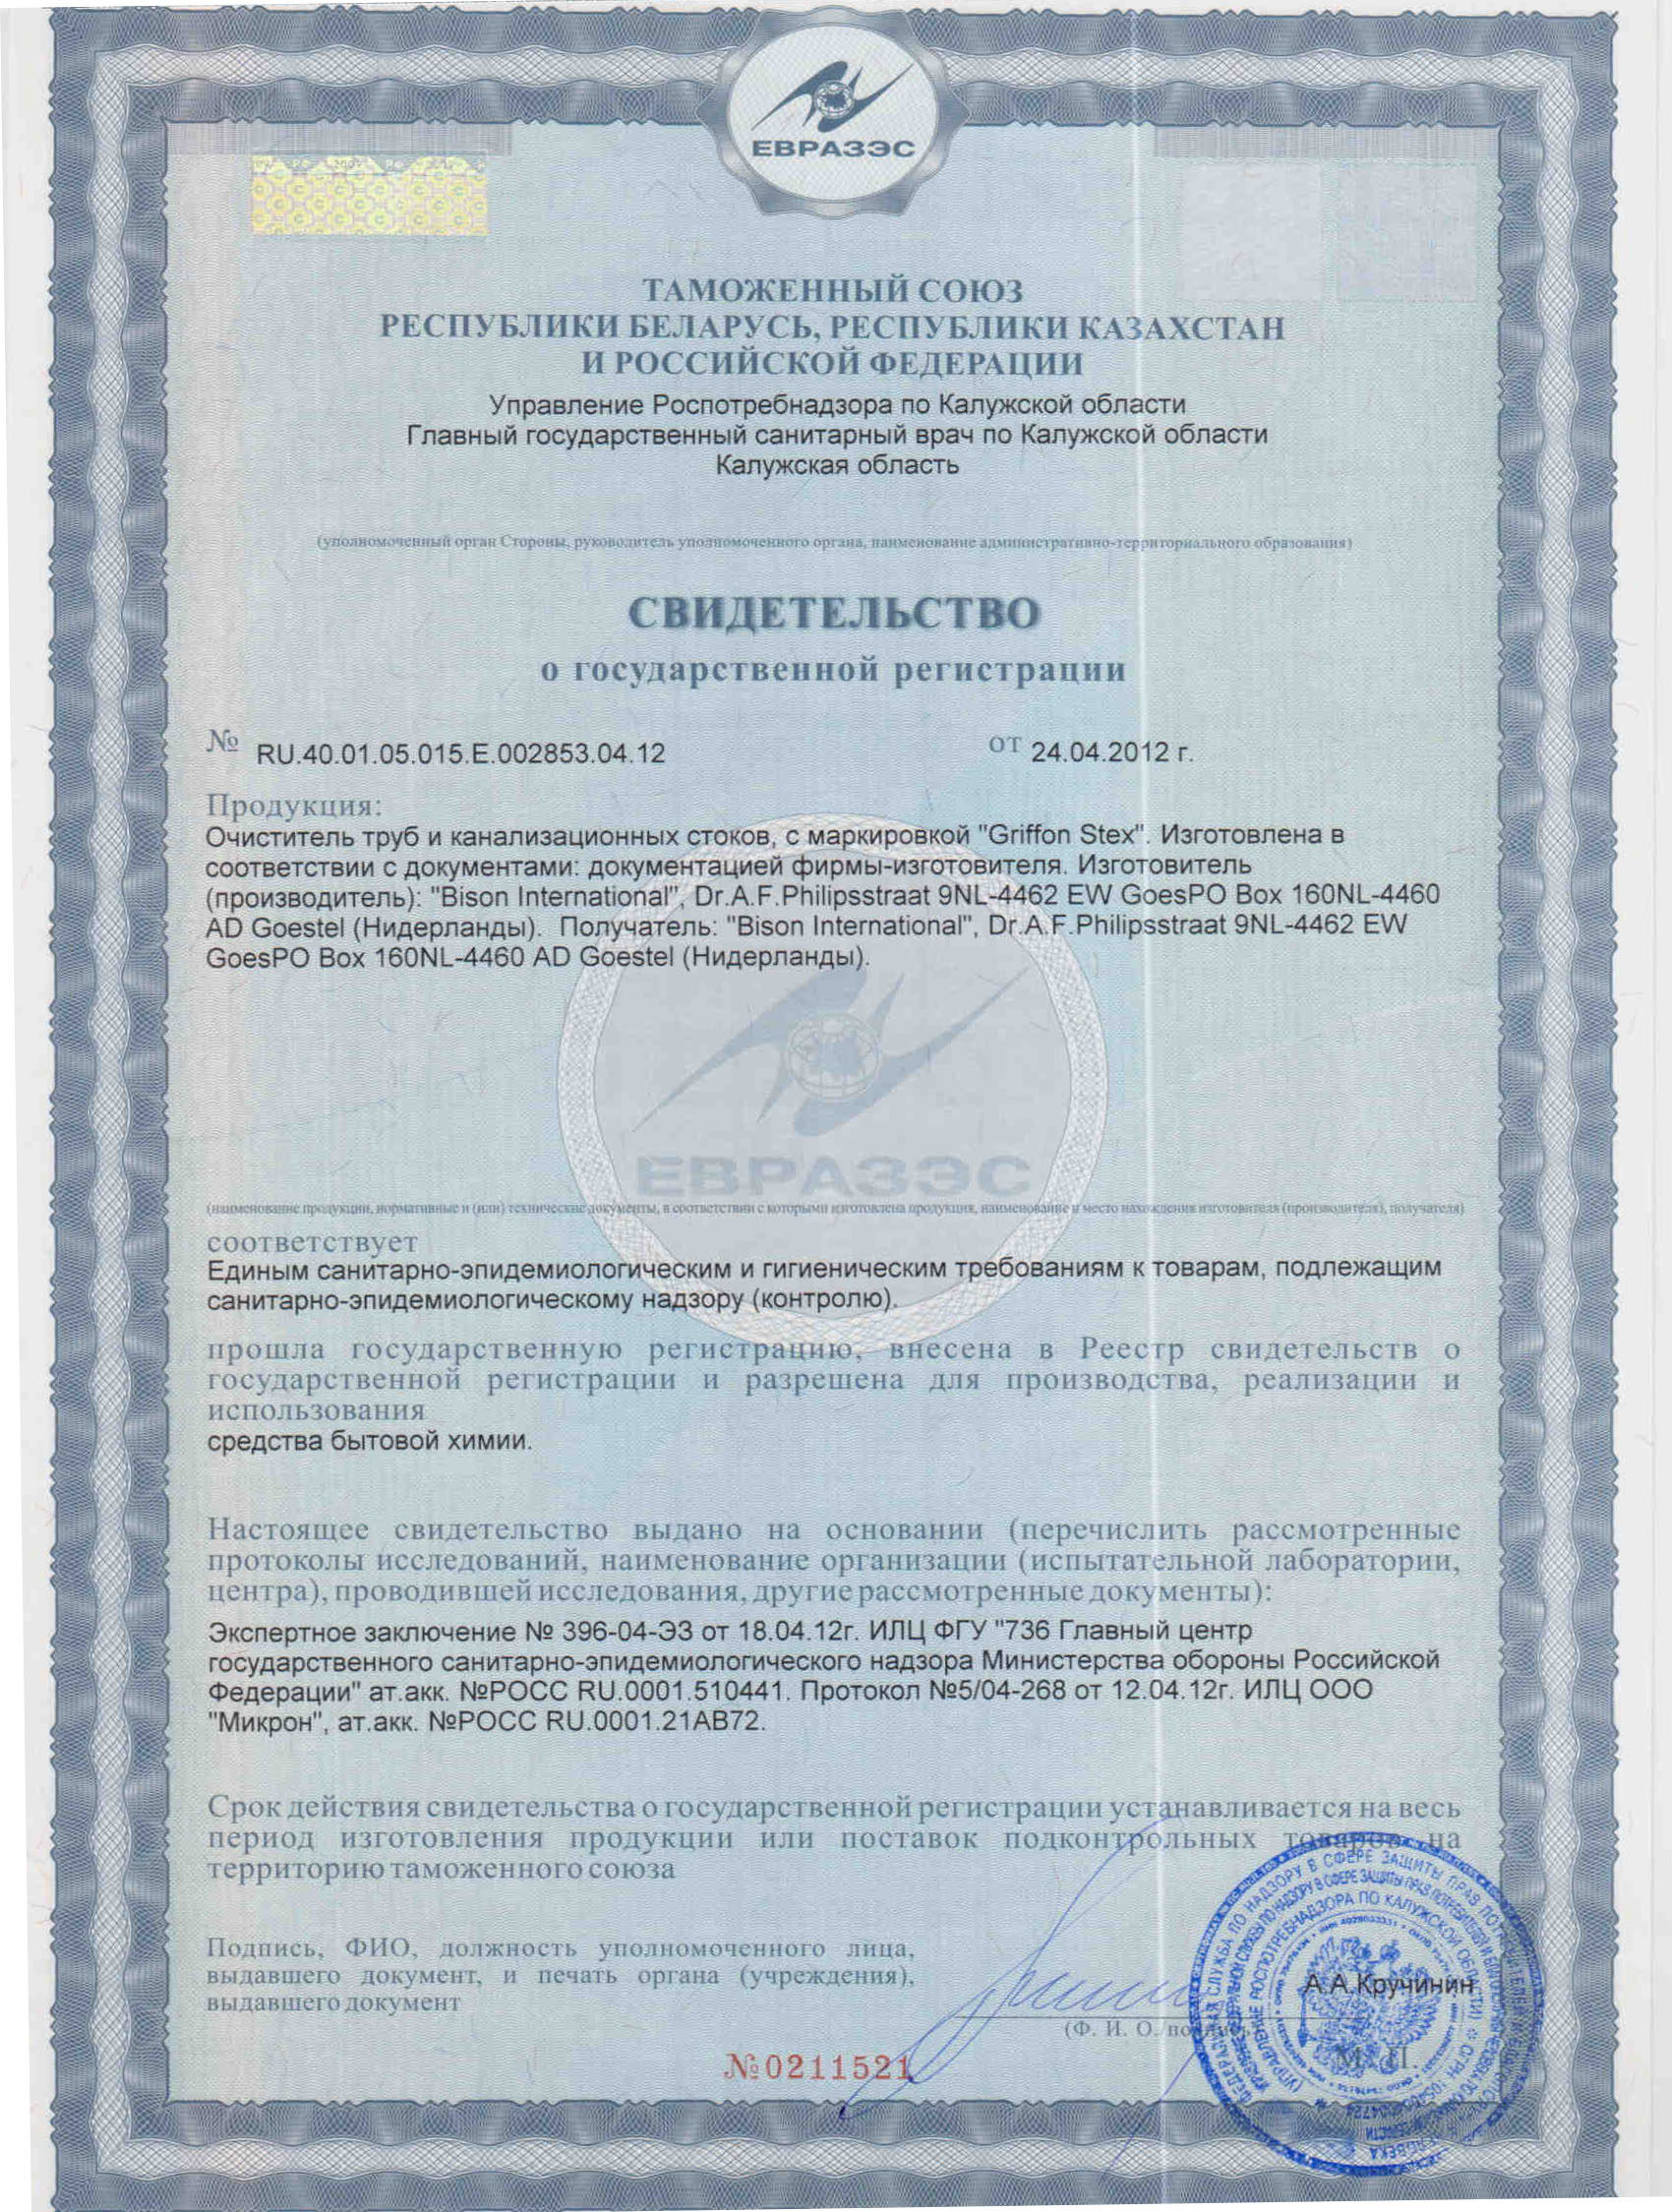 Сертификат EBPAPЭС